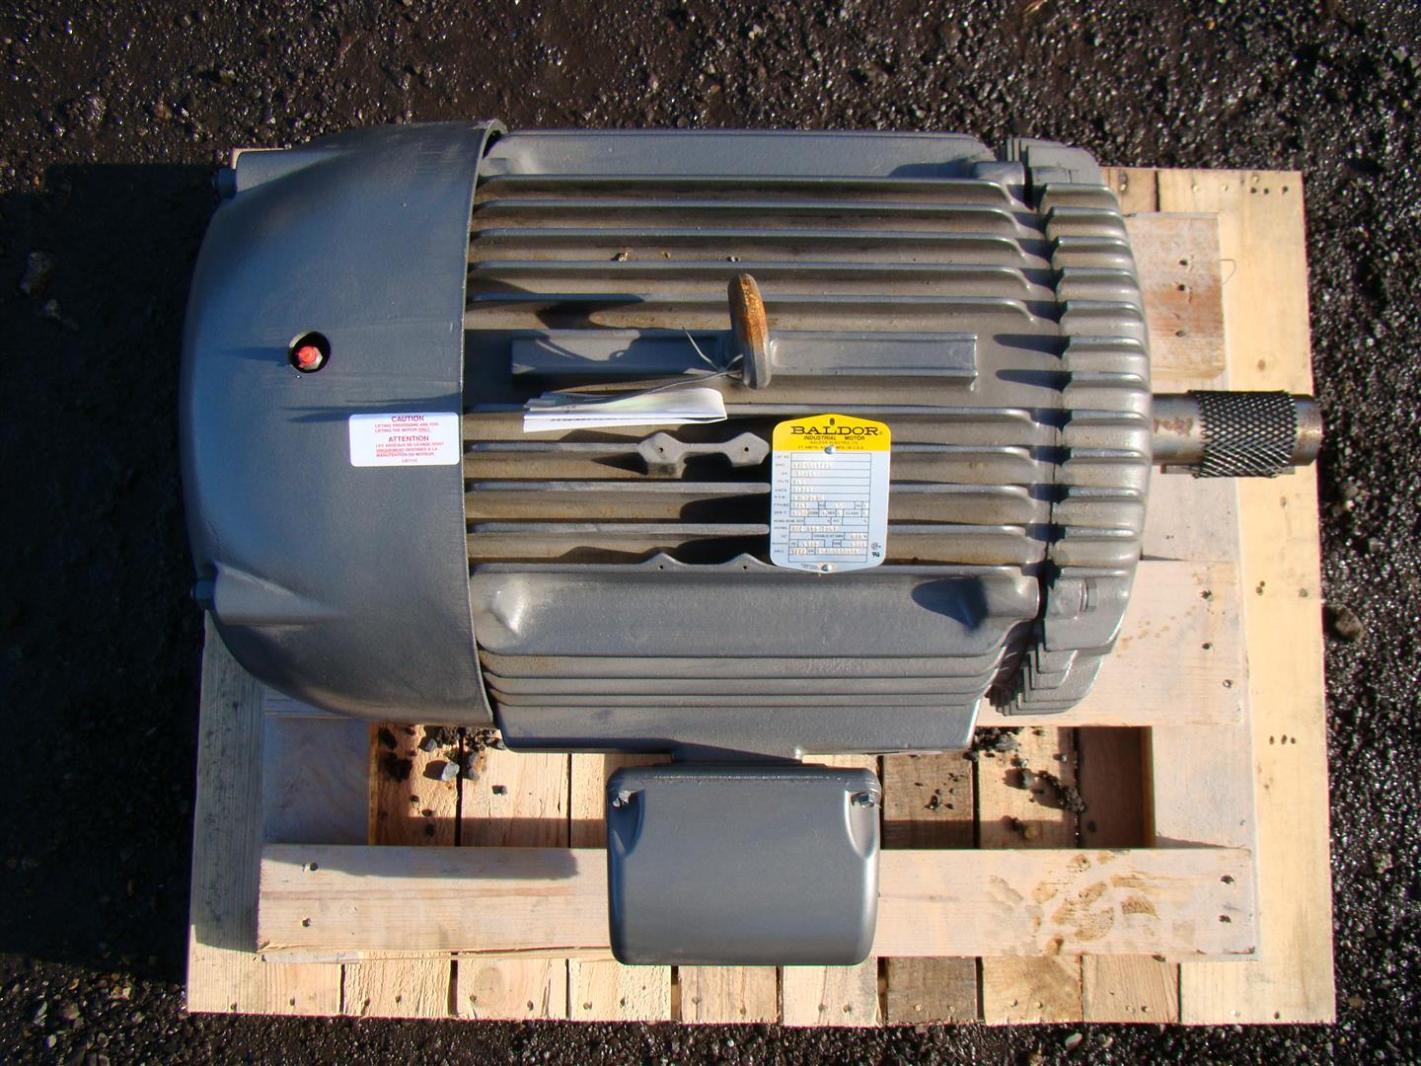 Baldor Industrial Electric Motor 30hp 460v 1760 870rpm